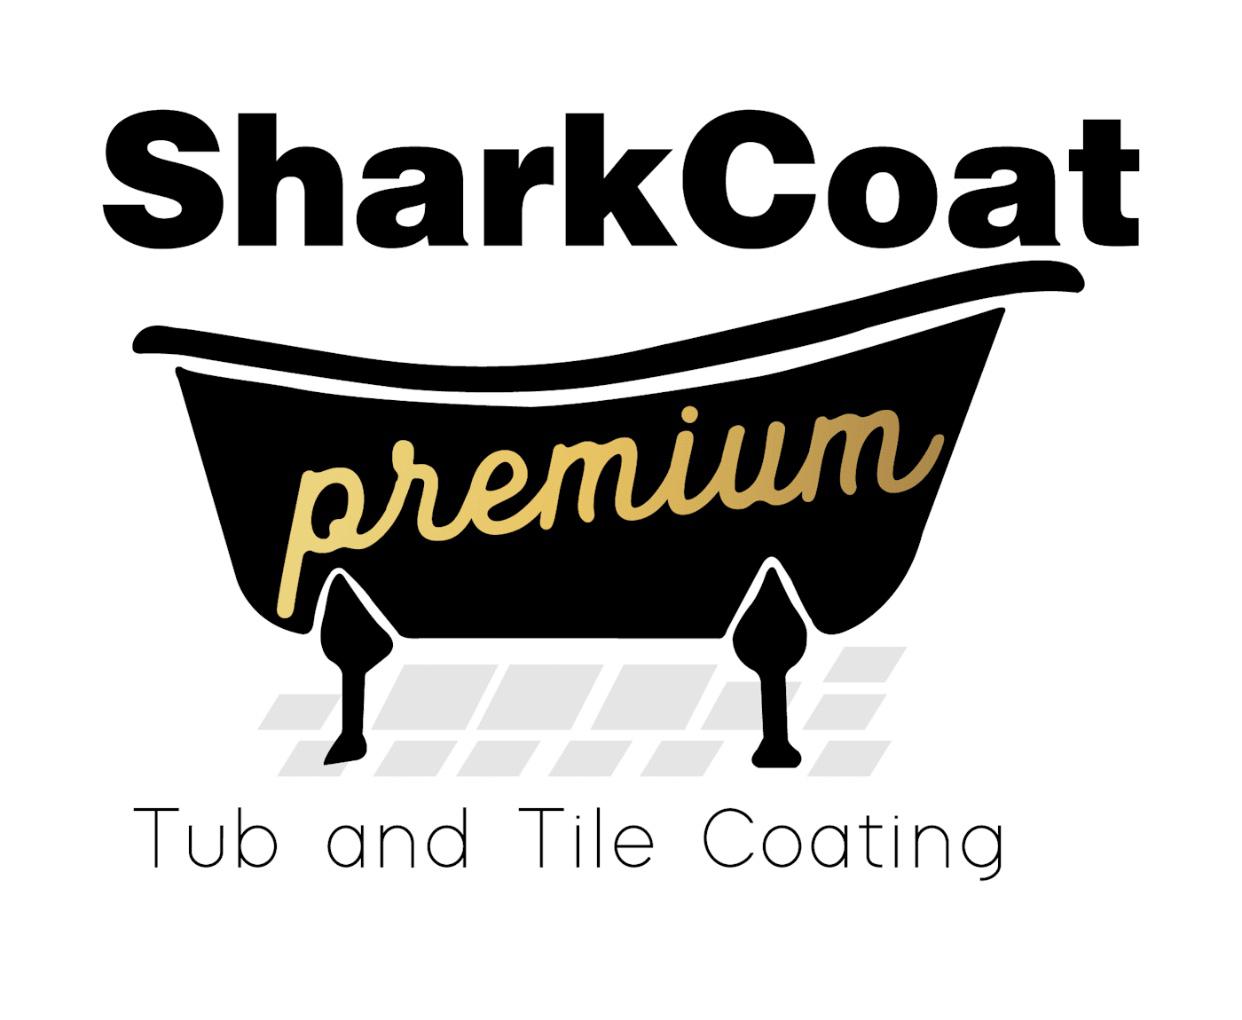 SharkCoat Tub and Walls Refinishing - 5 Coat System 5 Coats Tub and Walls